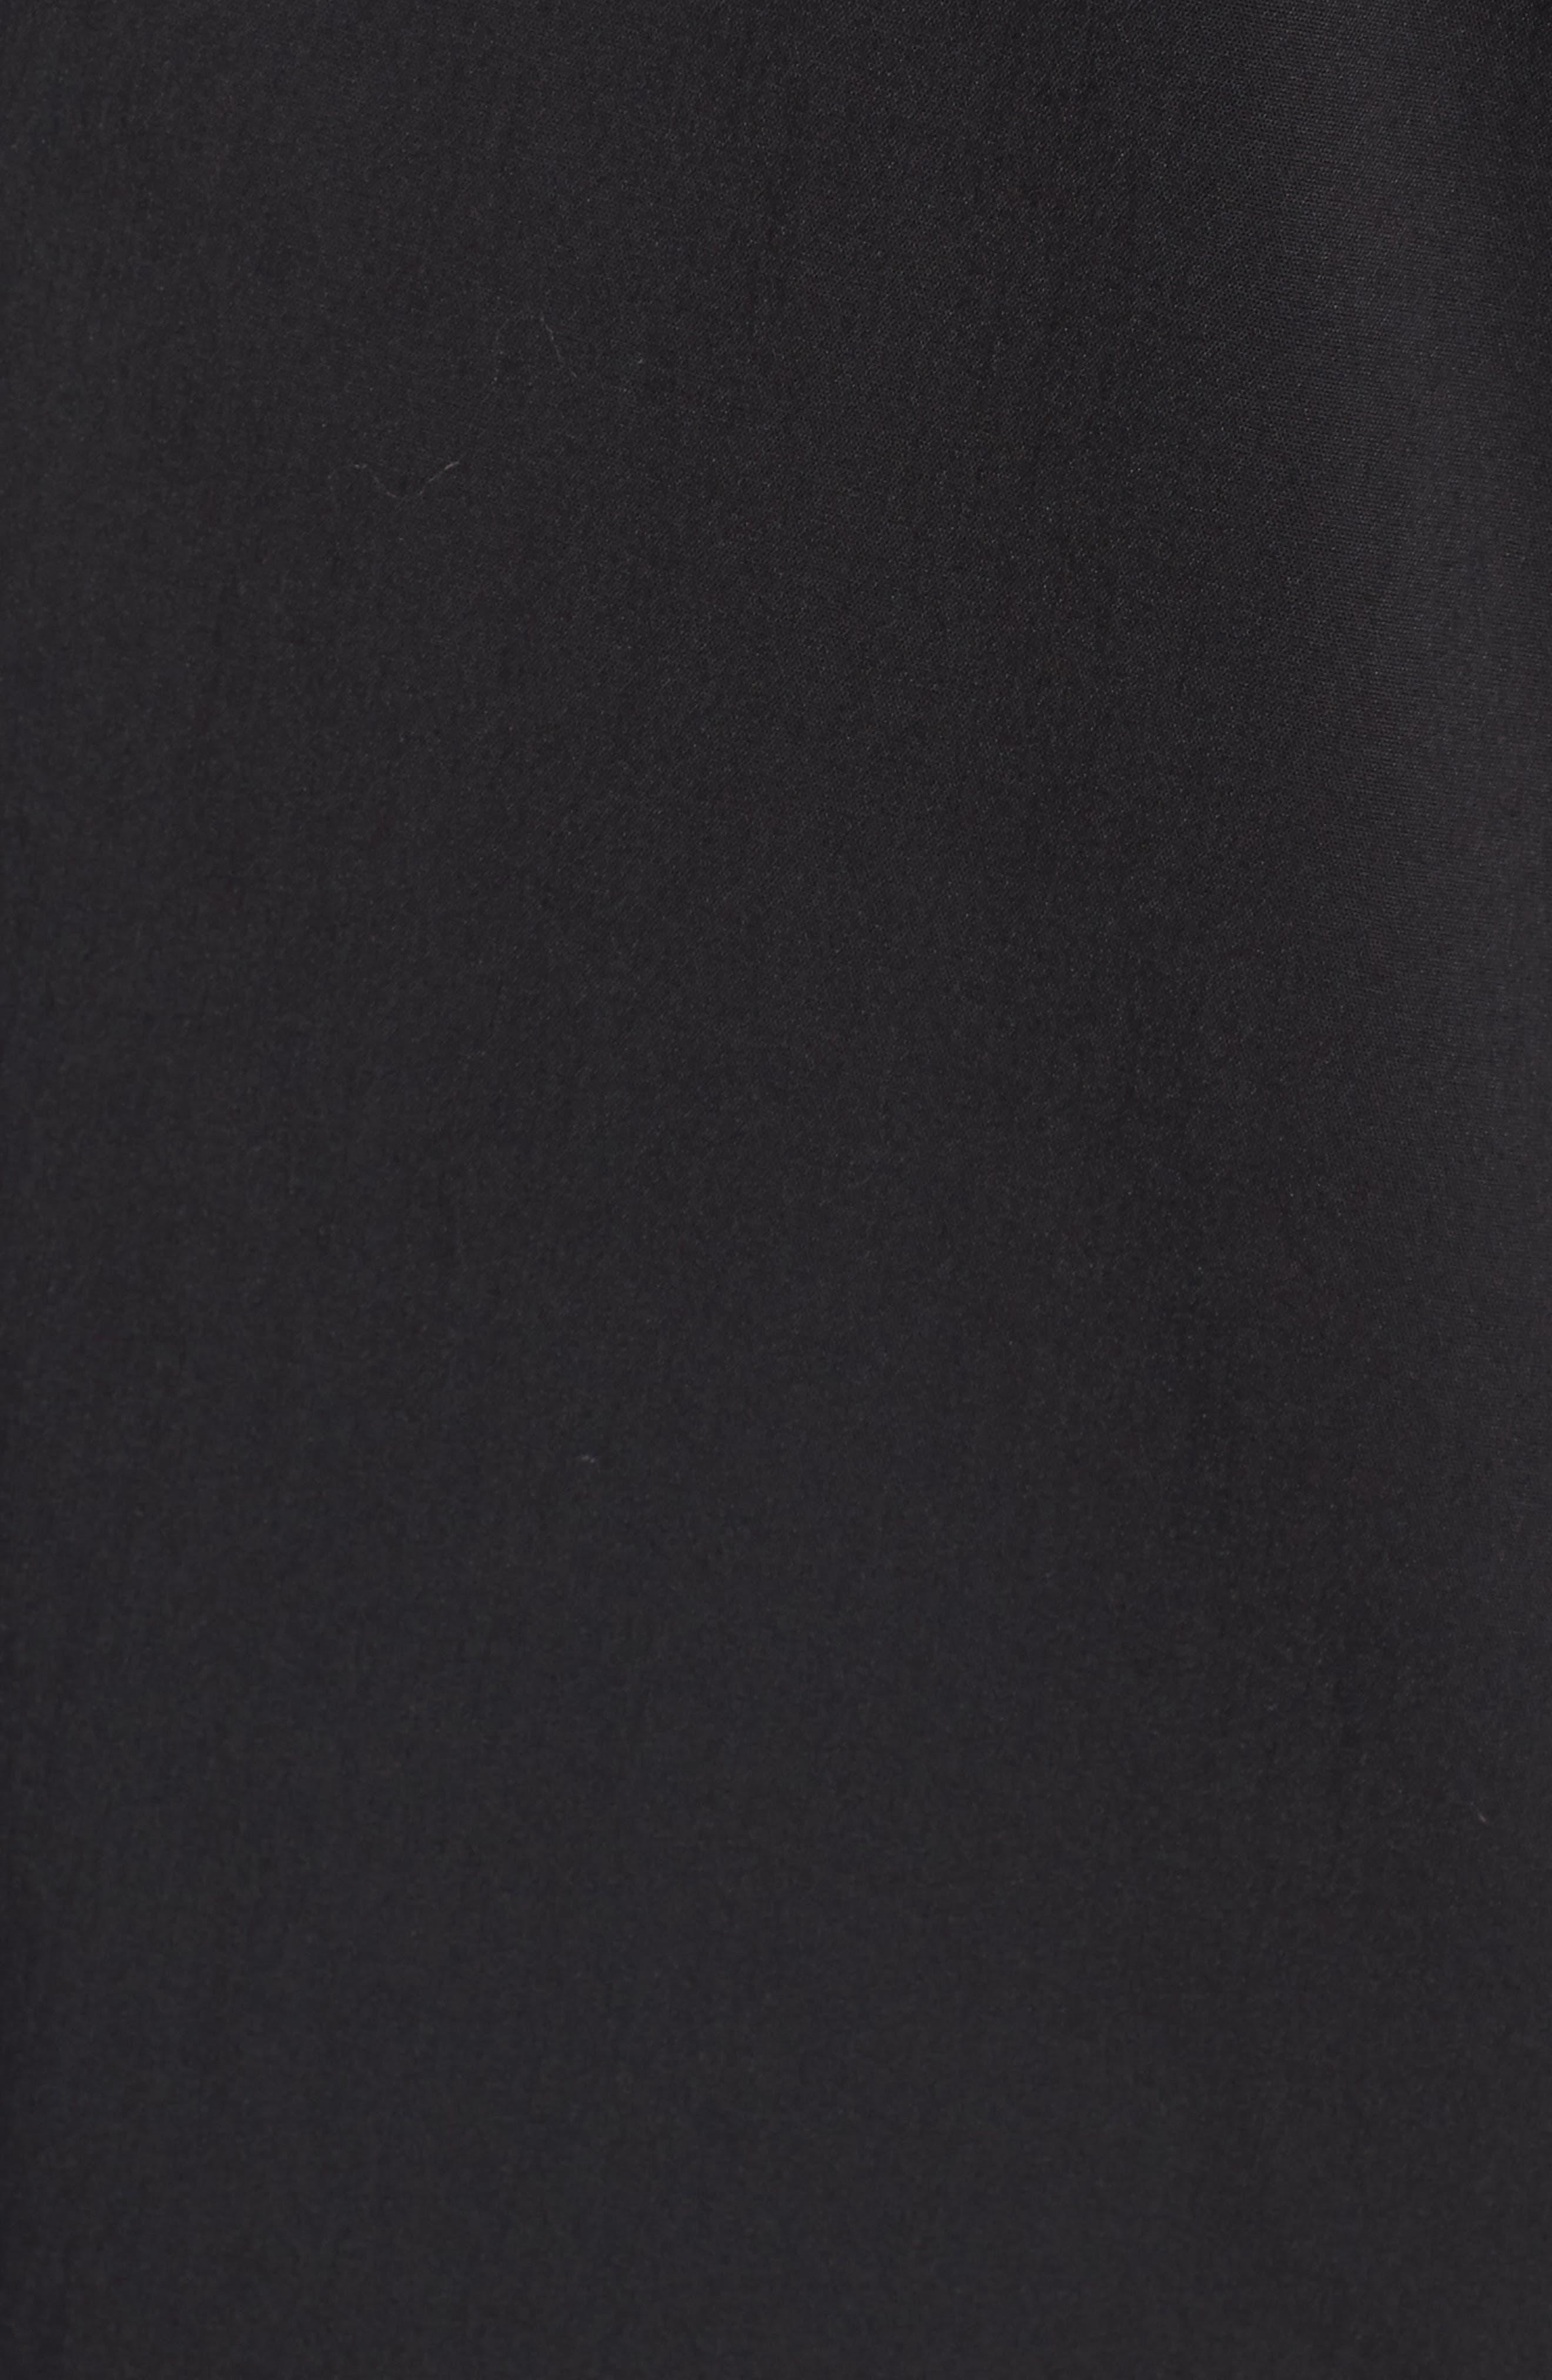 Cinch Sleeve Off the Shoulder Dress,                             Alternate thumbnail 5, color,                             001